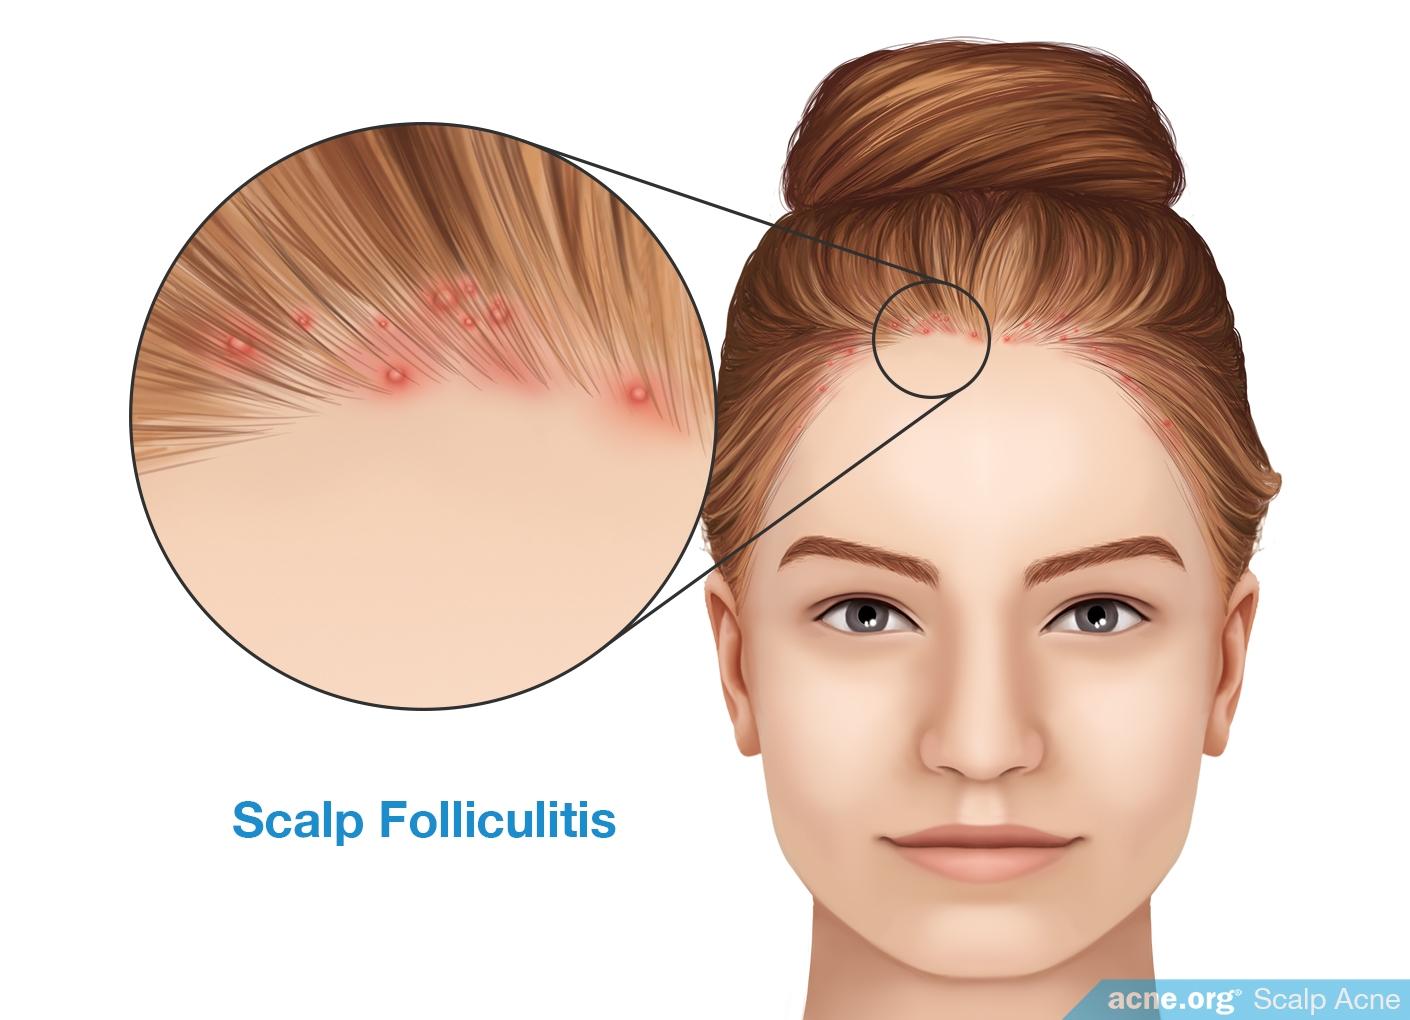 Scalp Folliculitis - Acne.org